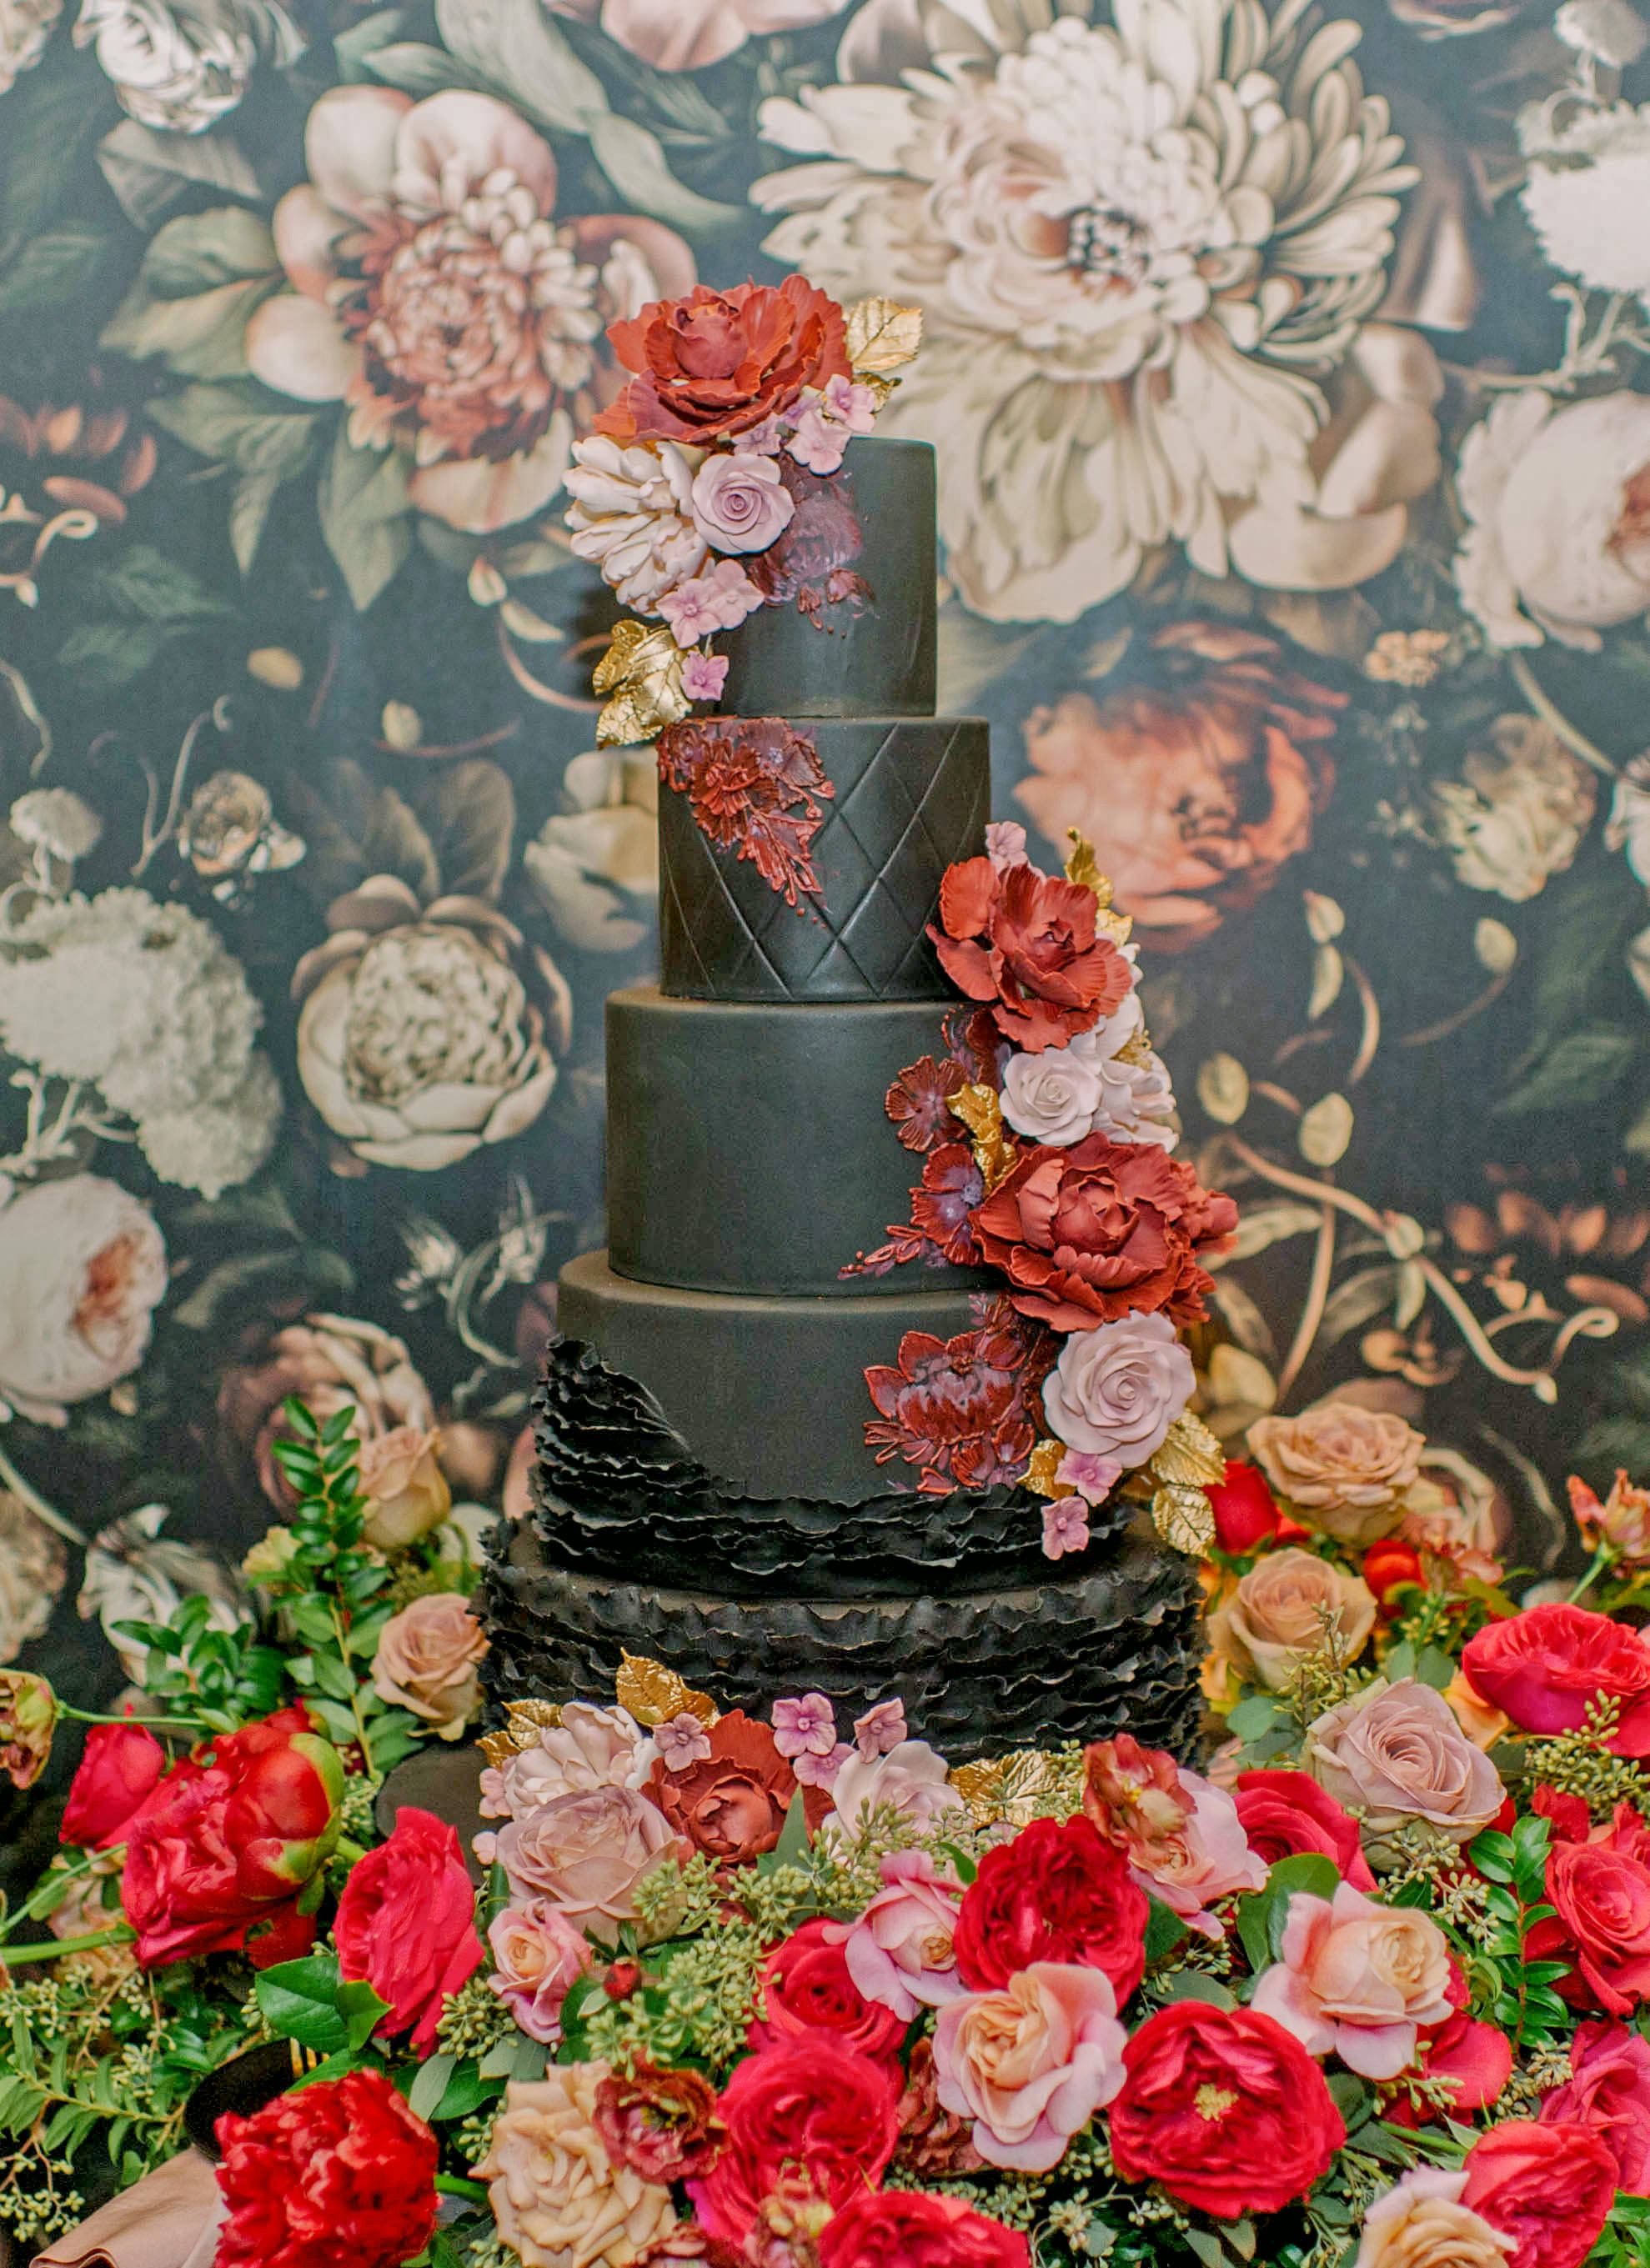 tillie dalton wedding cake